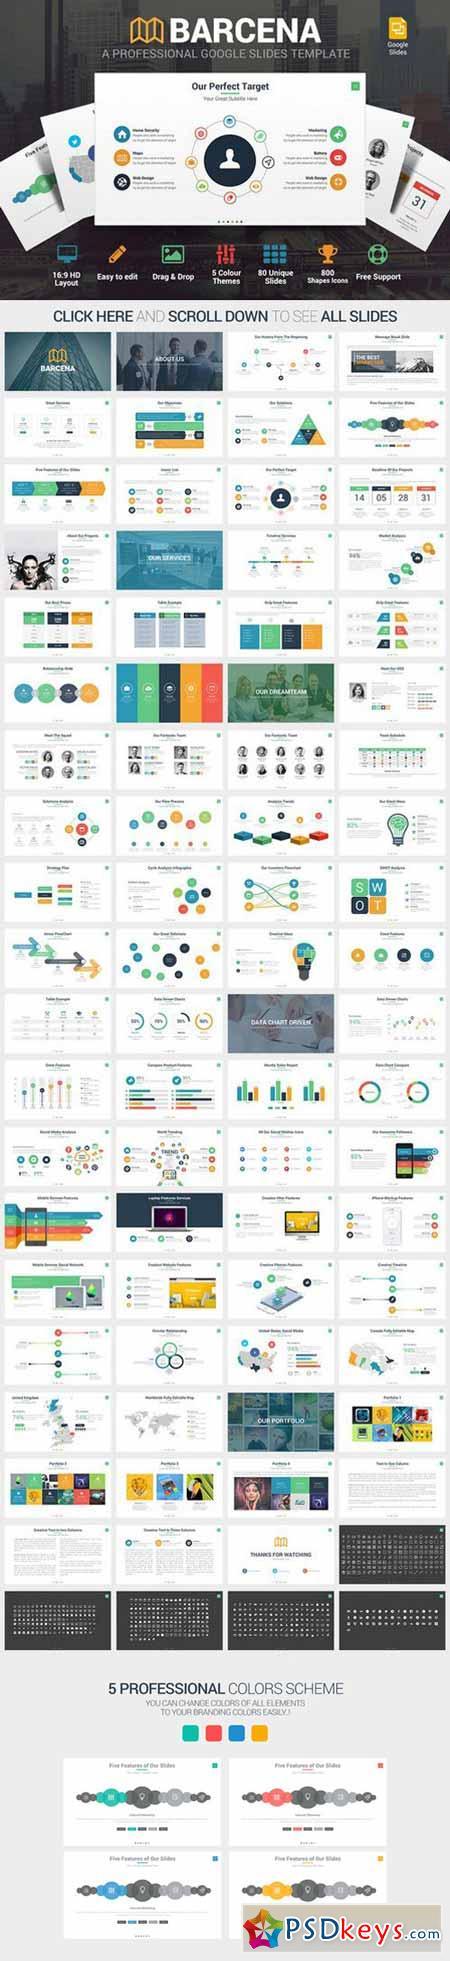 Barcena Google Slides Template 560759